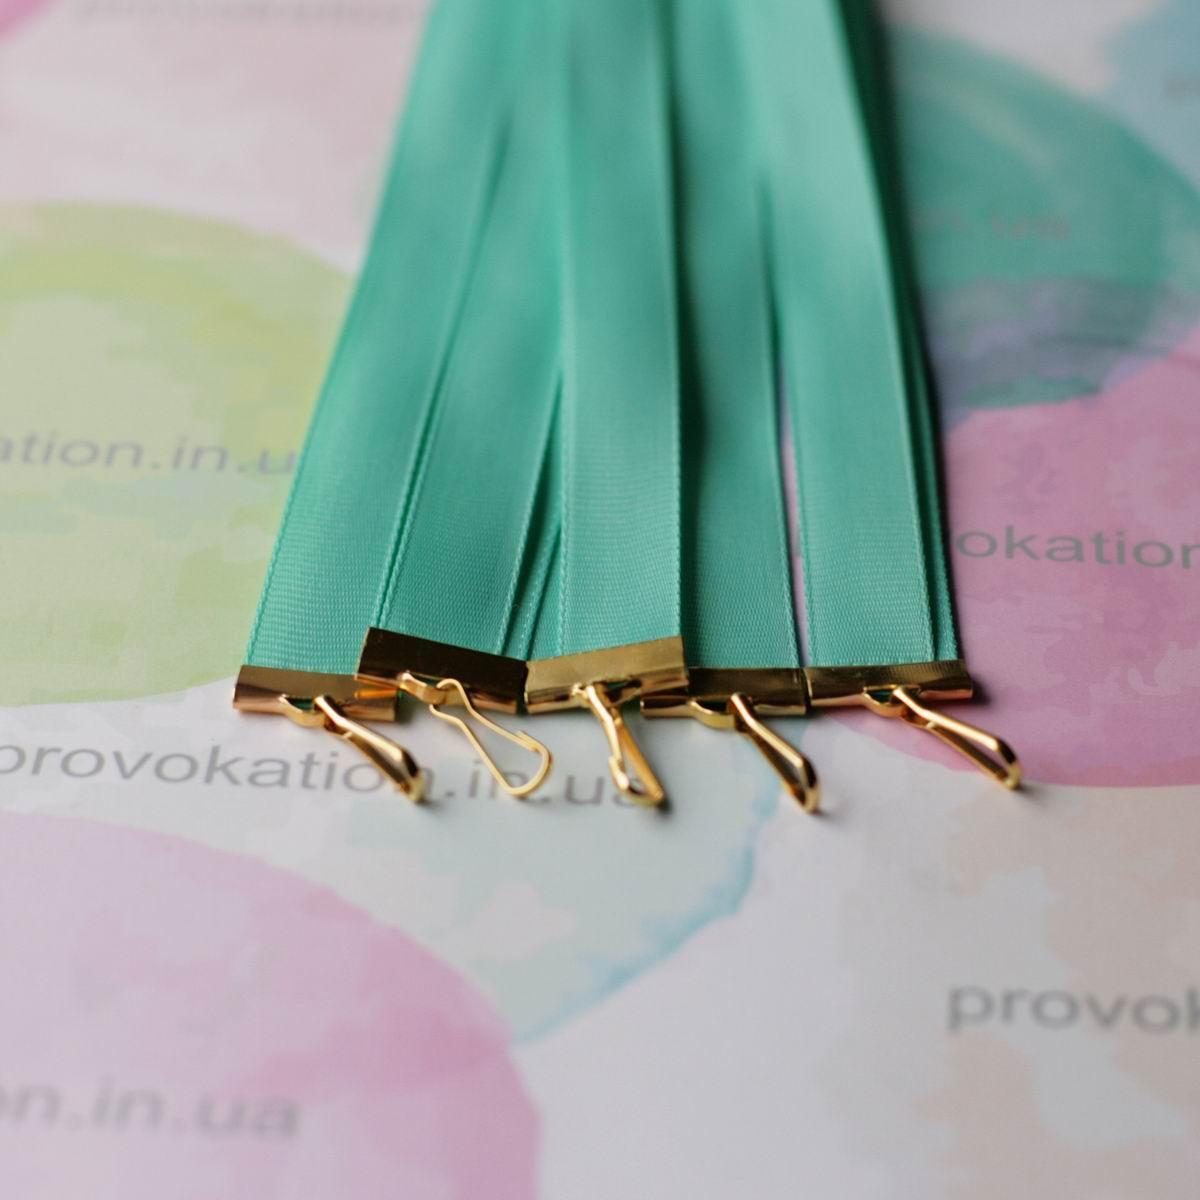 Лента для медалей и наград, Зеленая, 12мм, 65см